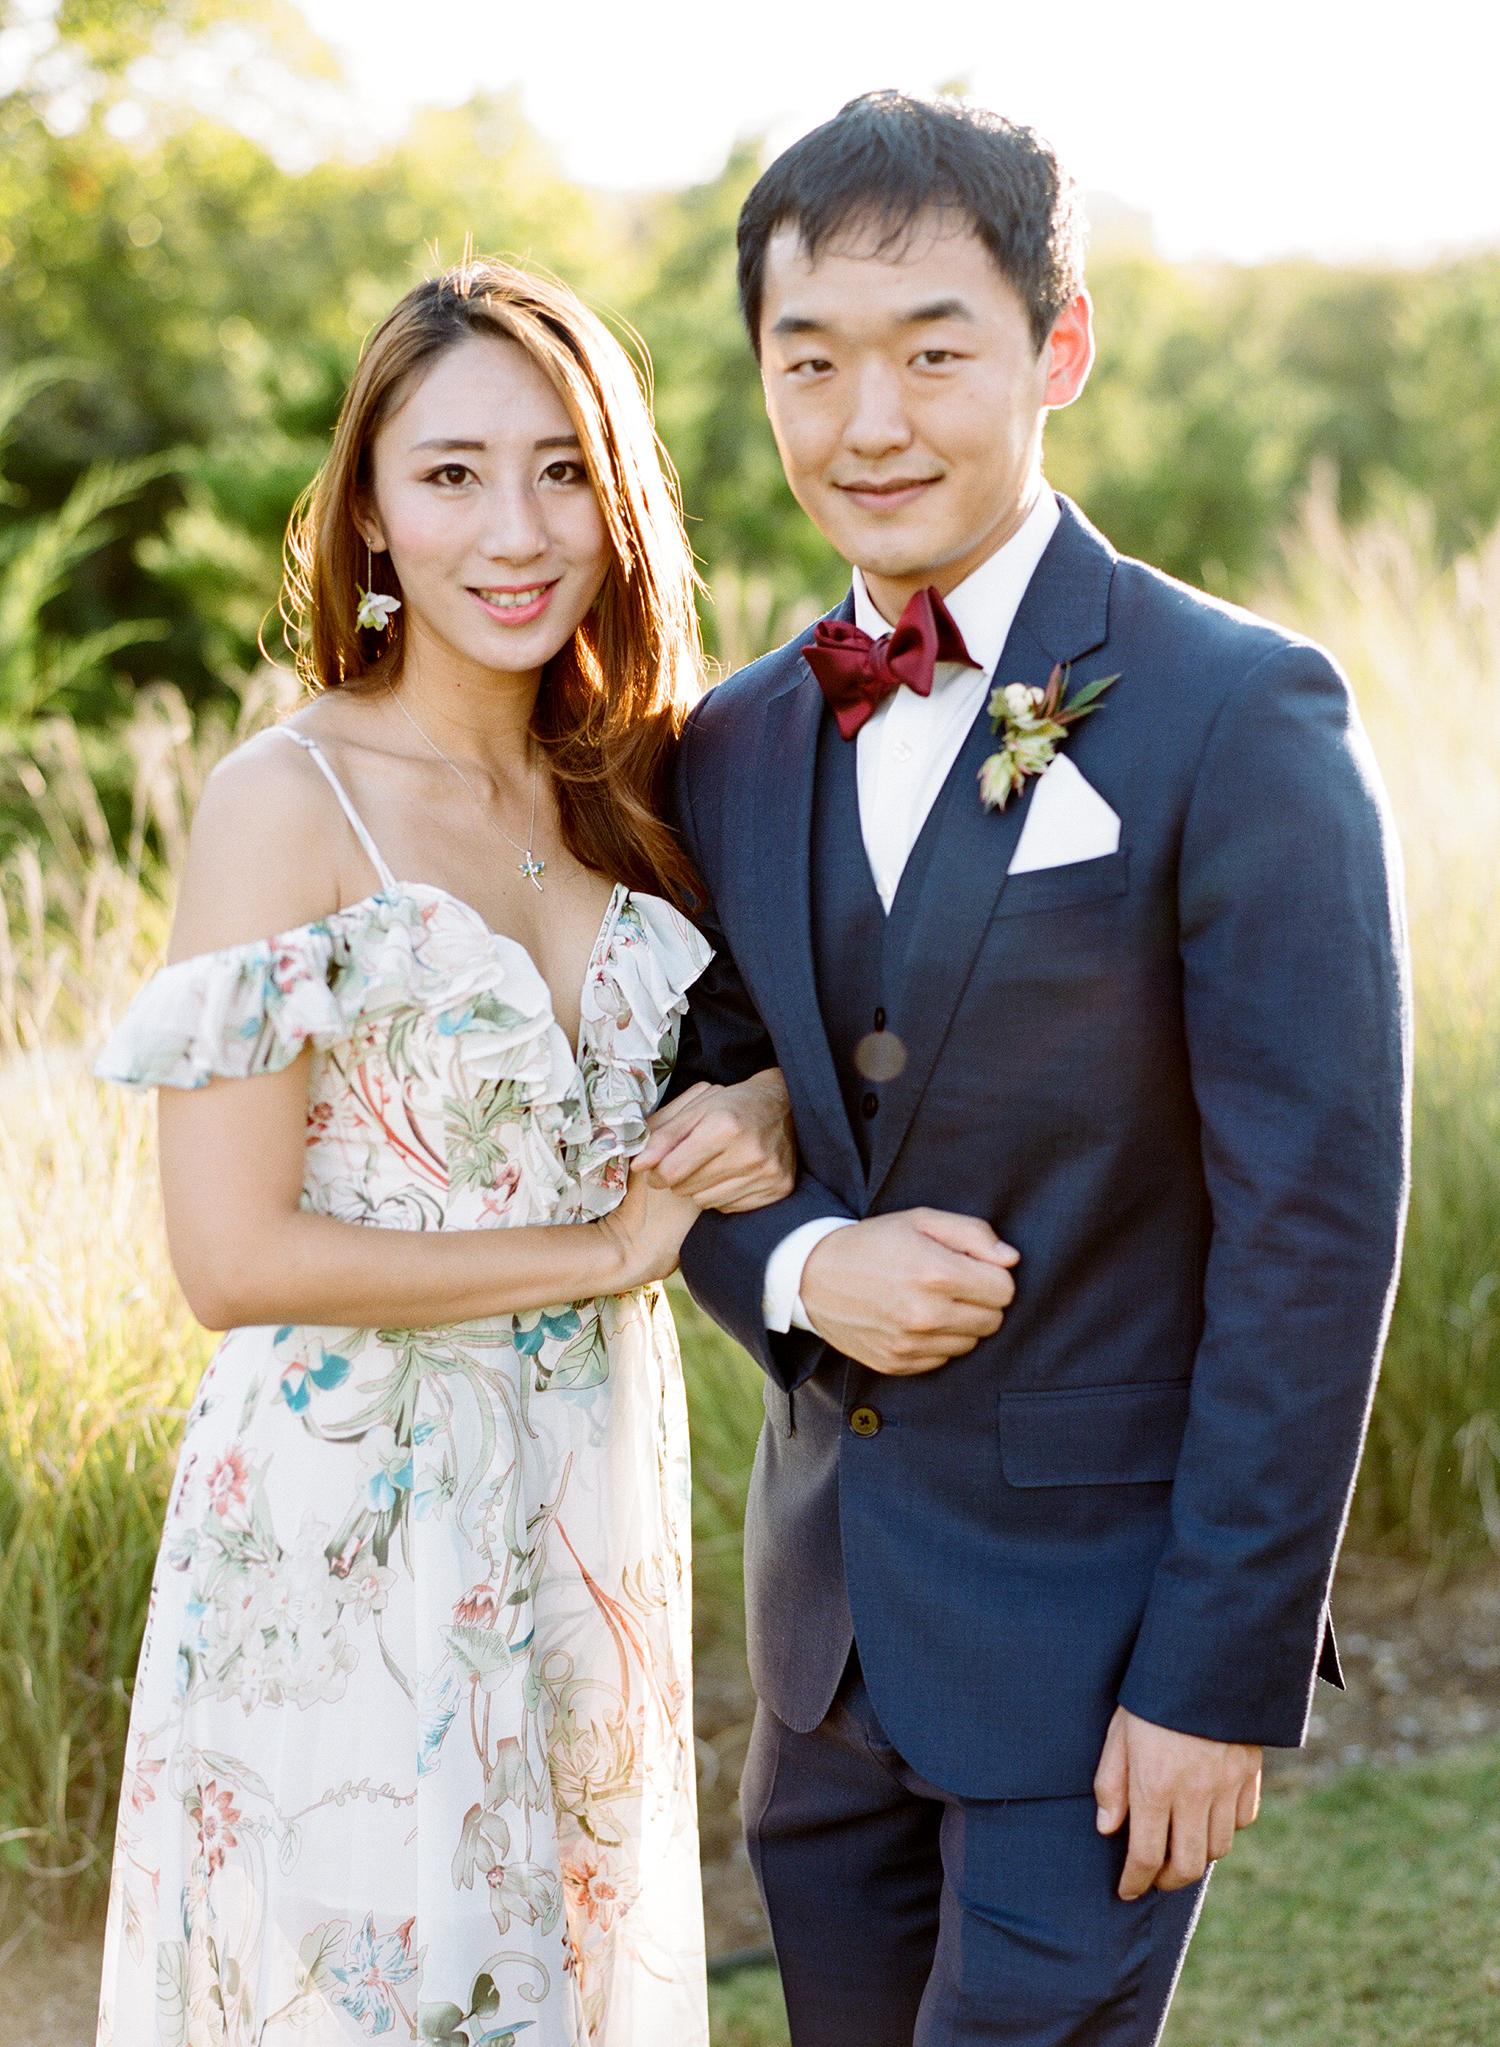 ivana nevin wedding guests